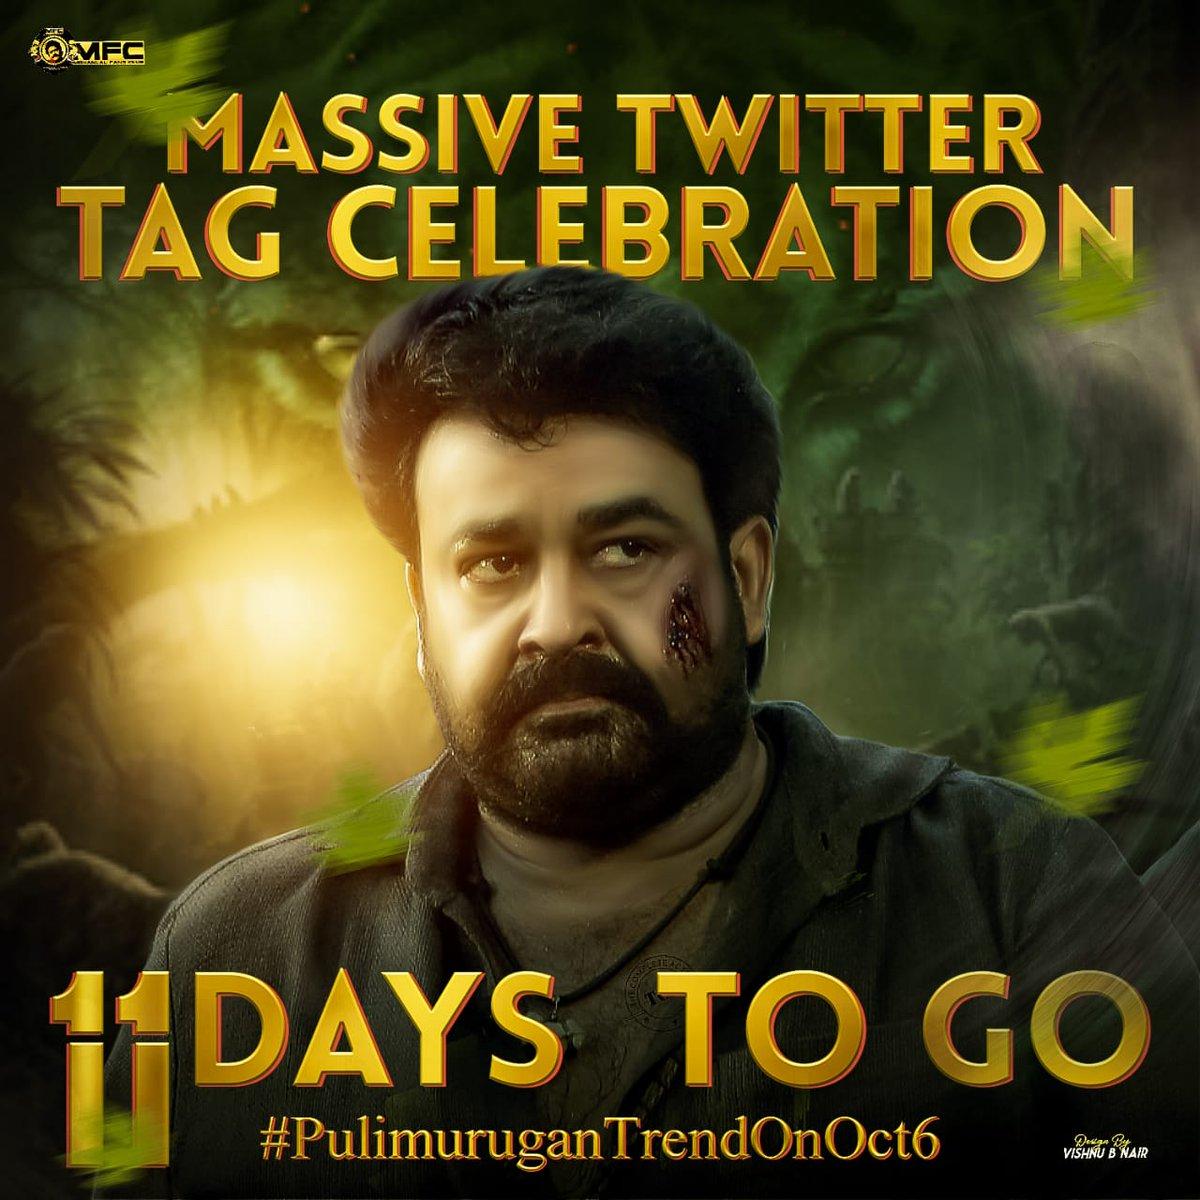 11 DAYS TO GO 💥  #PulimuruganTrendOnOctober6  #Lalettan  #Drishyam2  #Marakkar  Waiting for Grand Tweet 😍💯  Tweet Retweet  Follow Followback💯 https://t.co/Bx9TSfgTXy